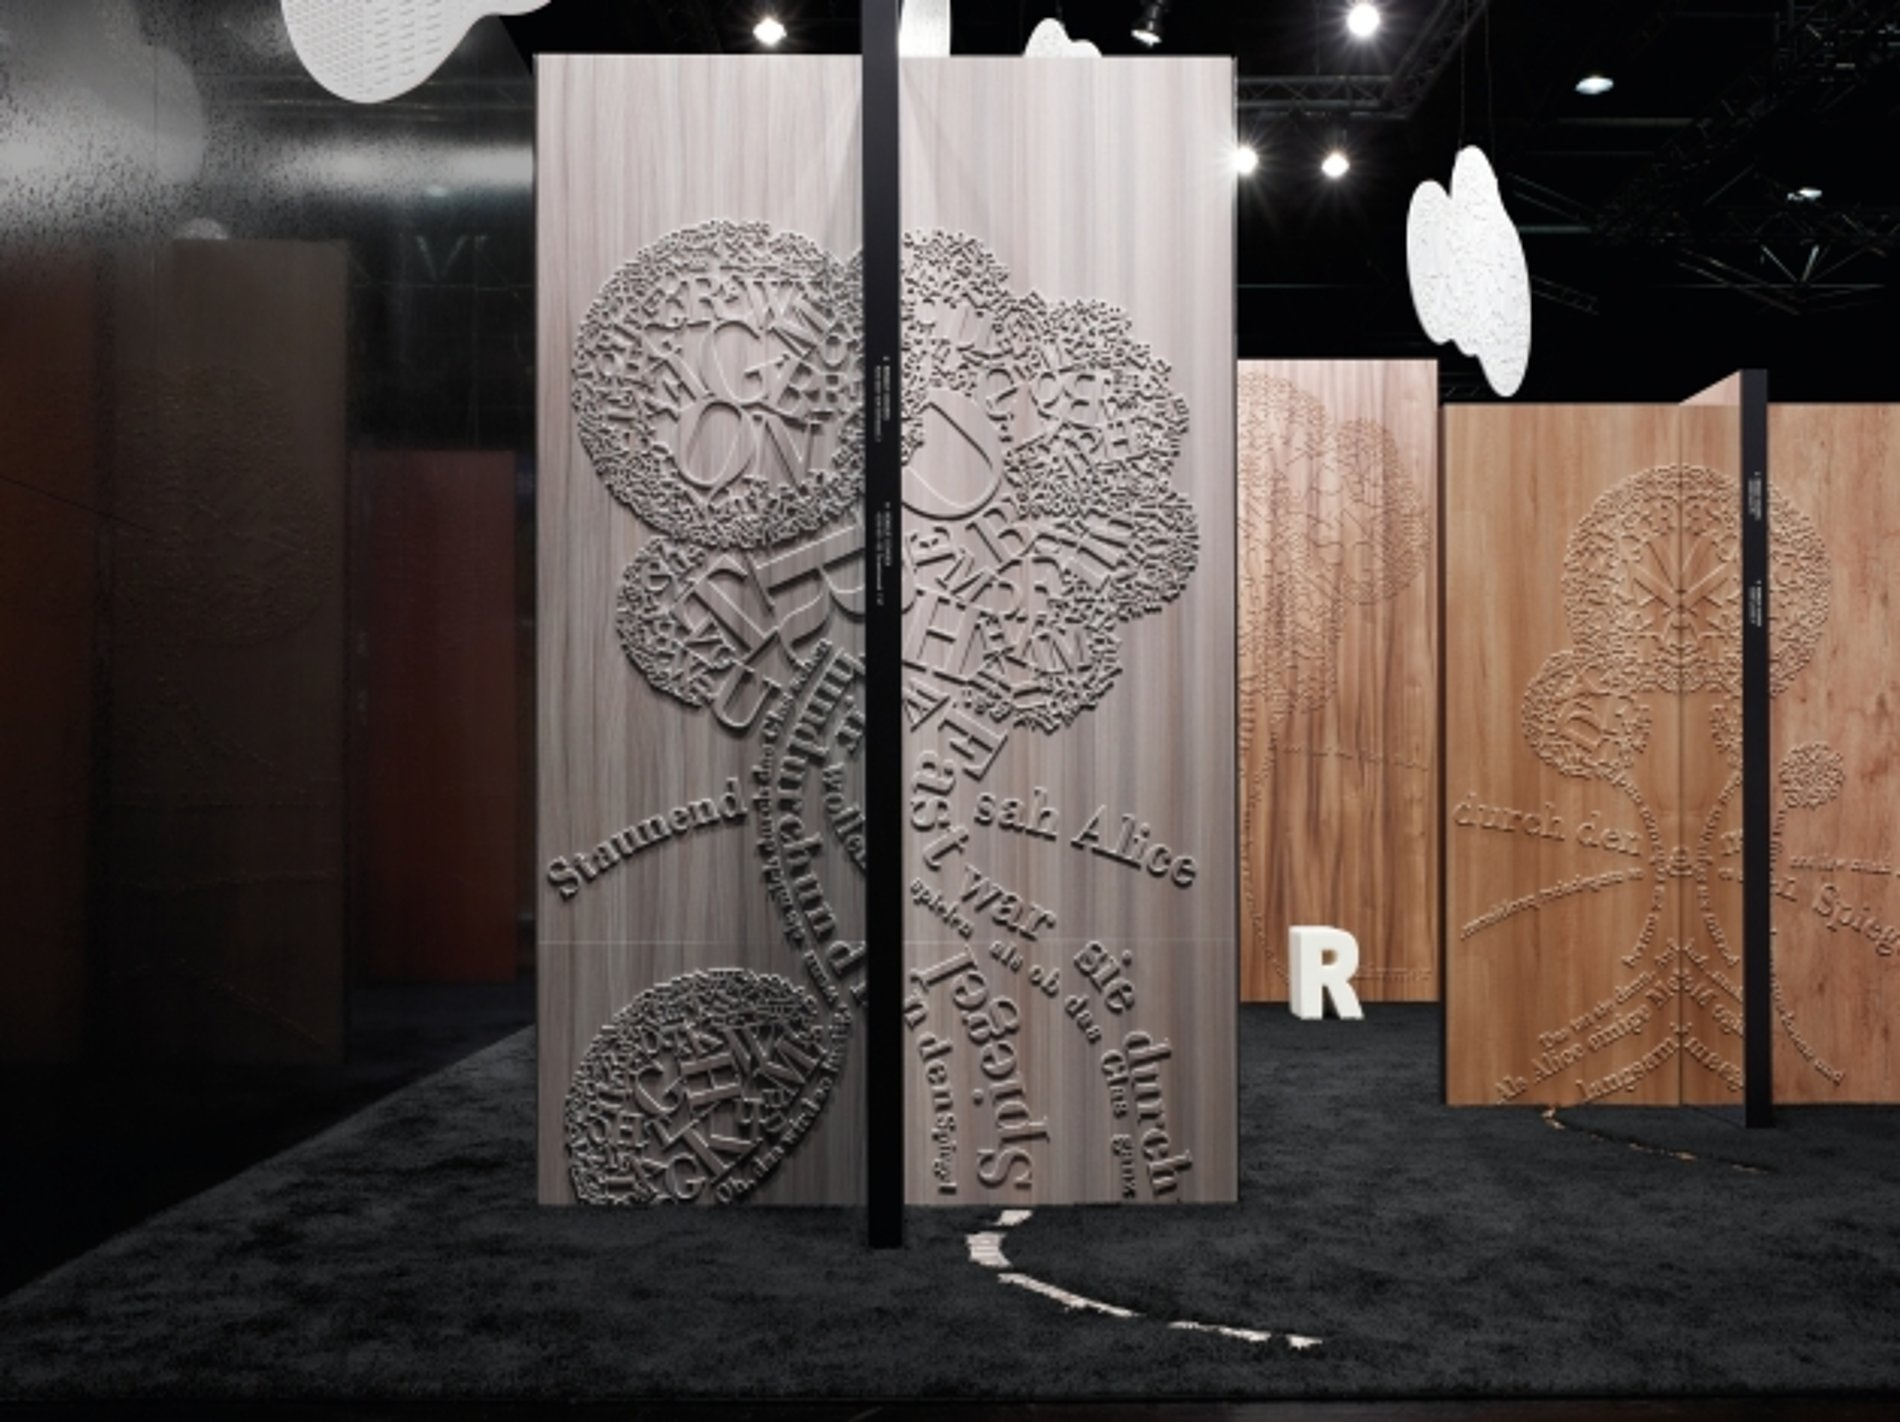 RENOLIT Trade Fair Stand EuroShop 2011 | Red Dot Design Award